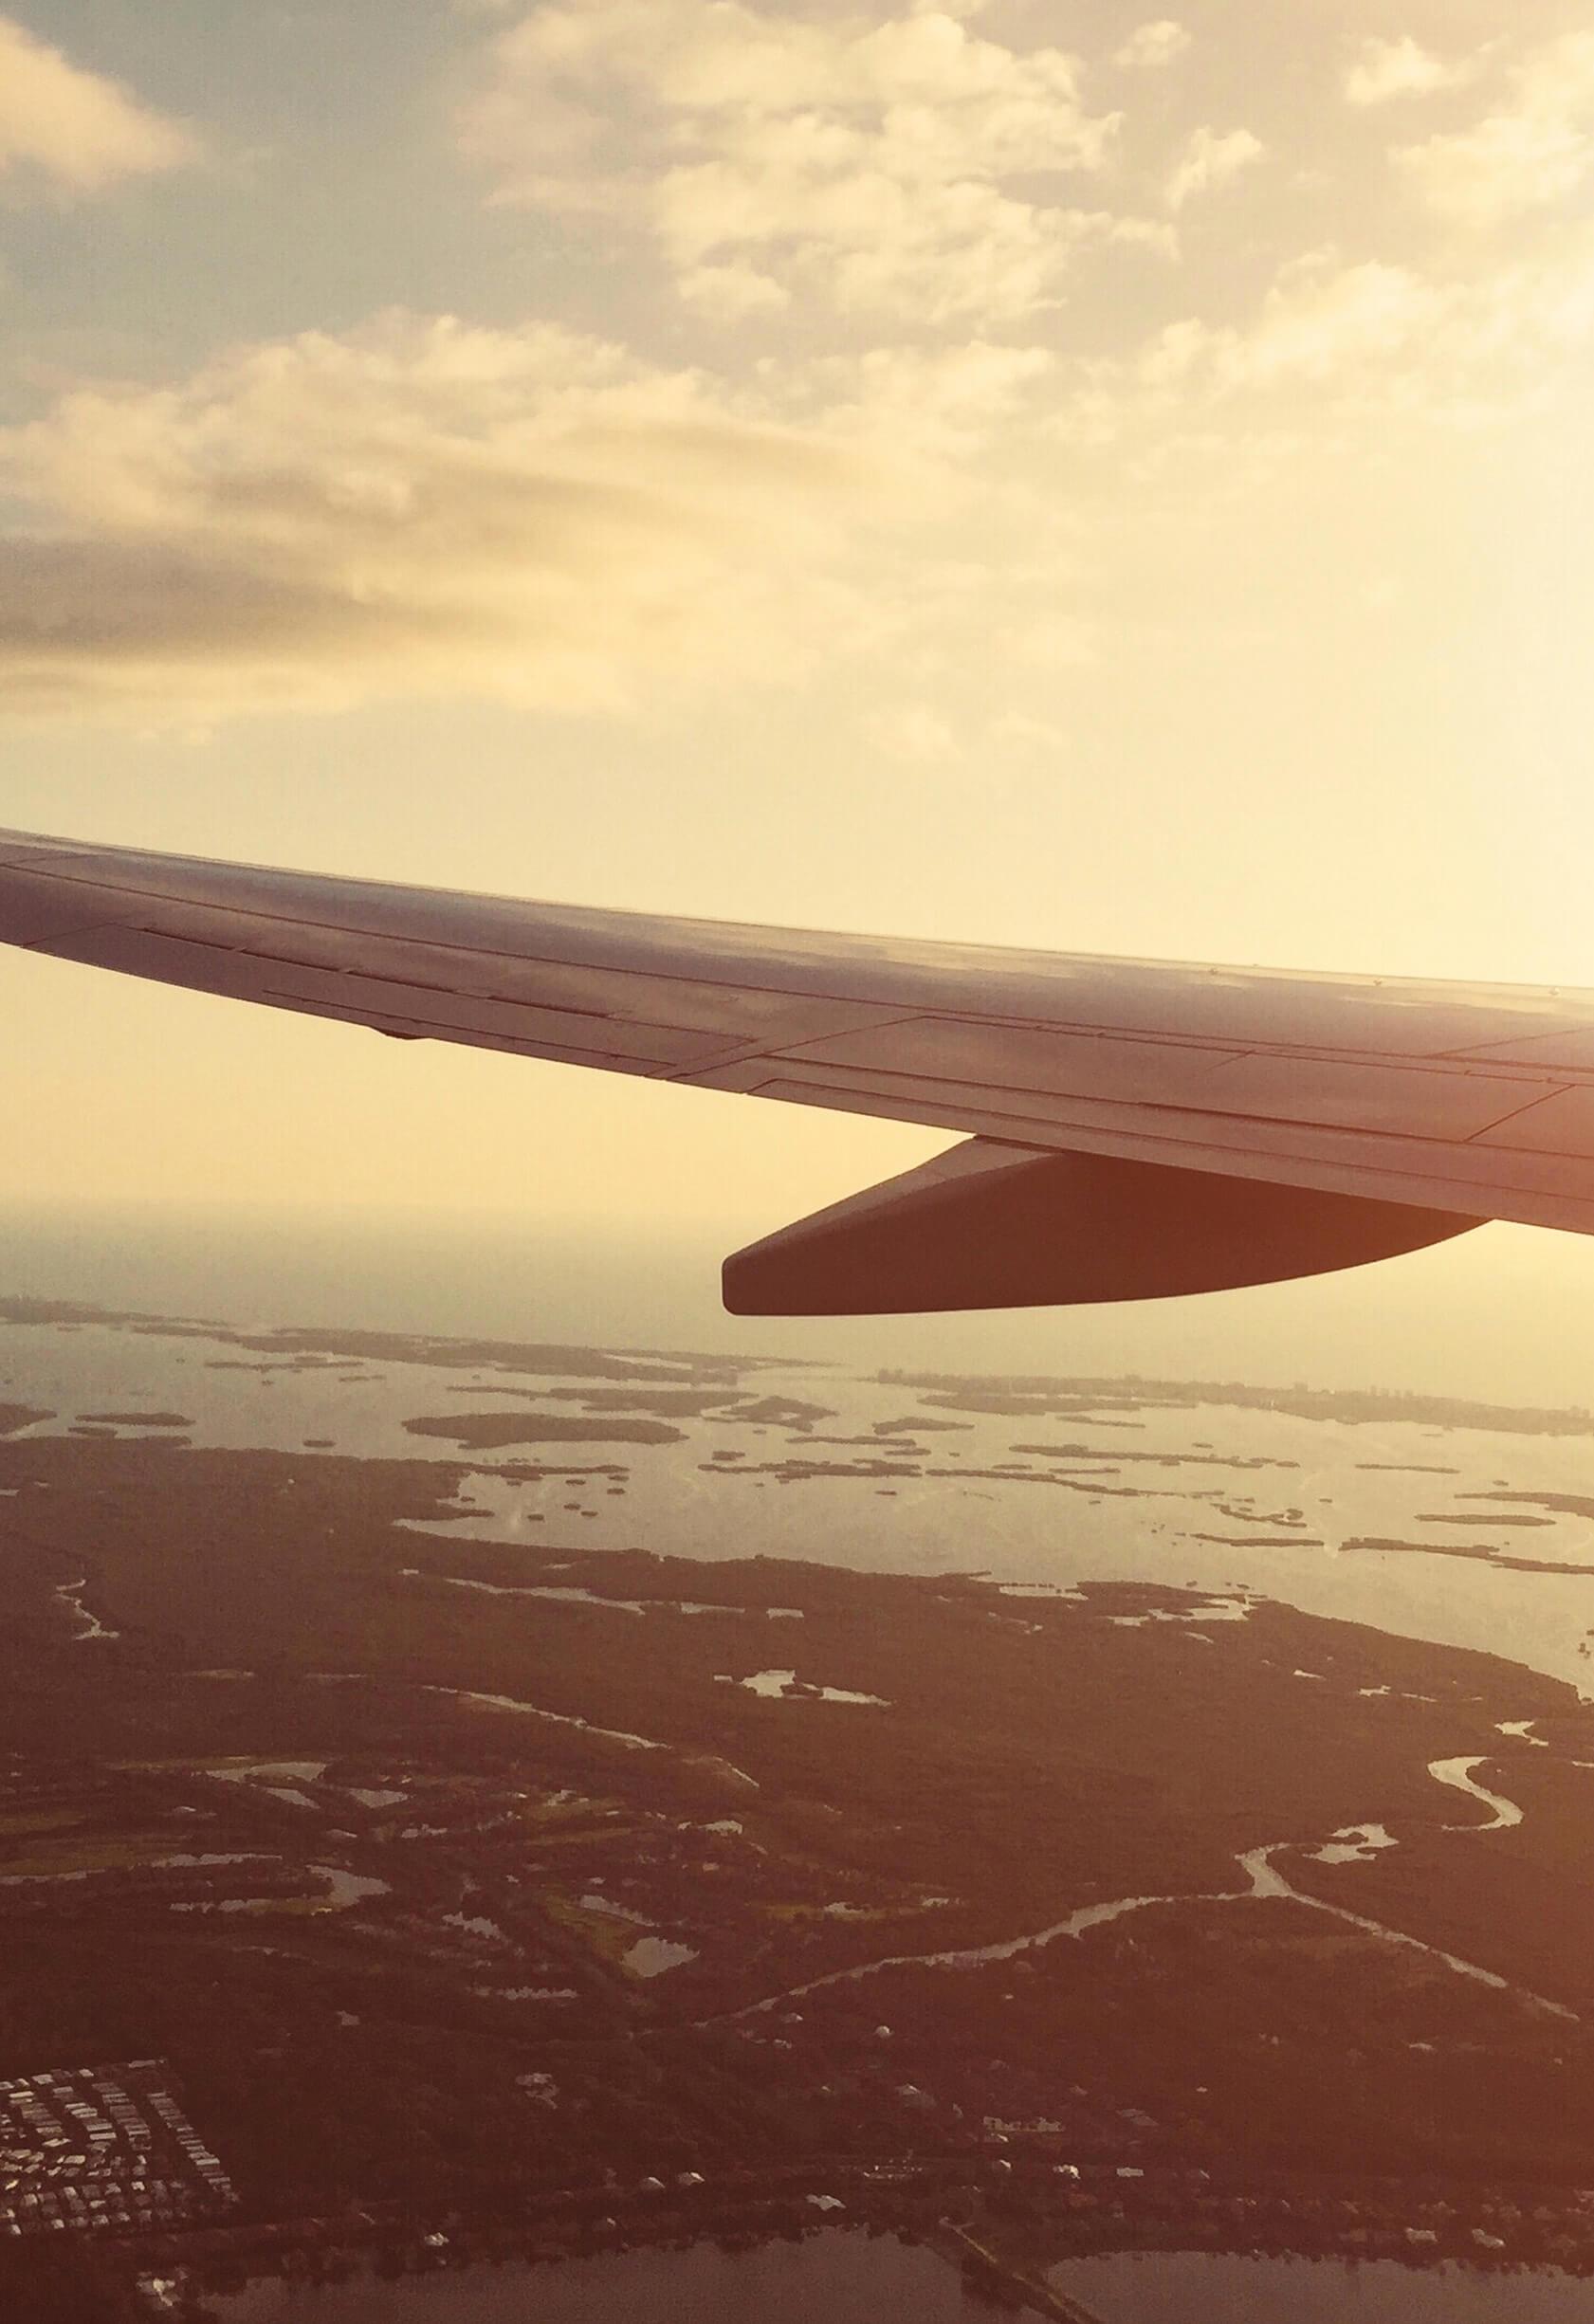 aeroplane representing air freight